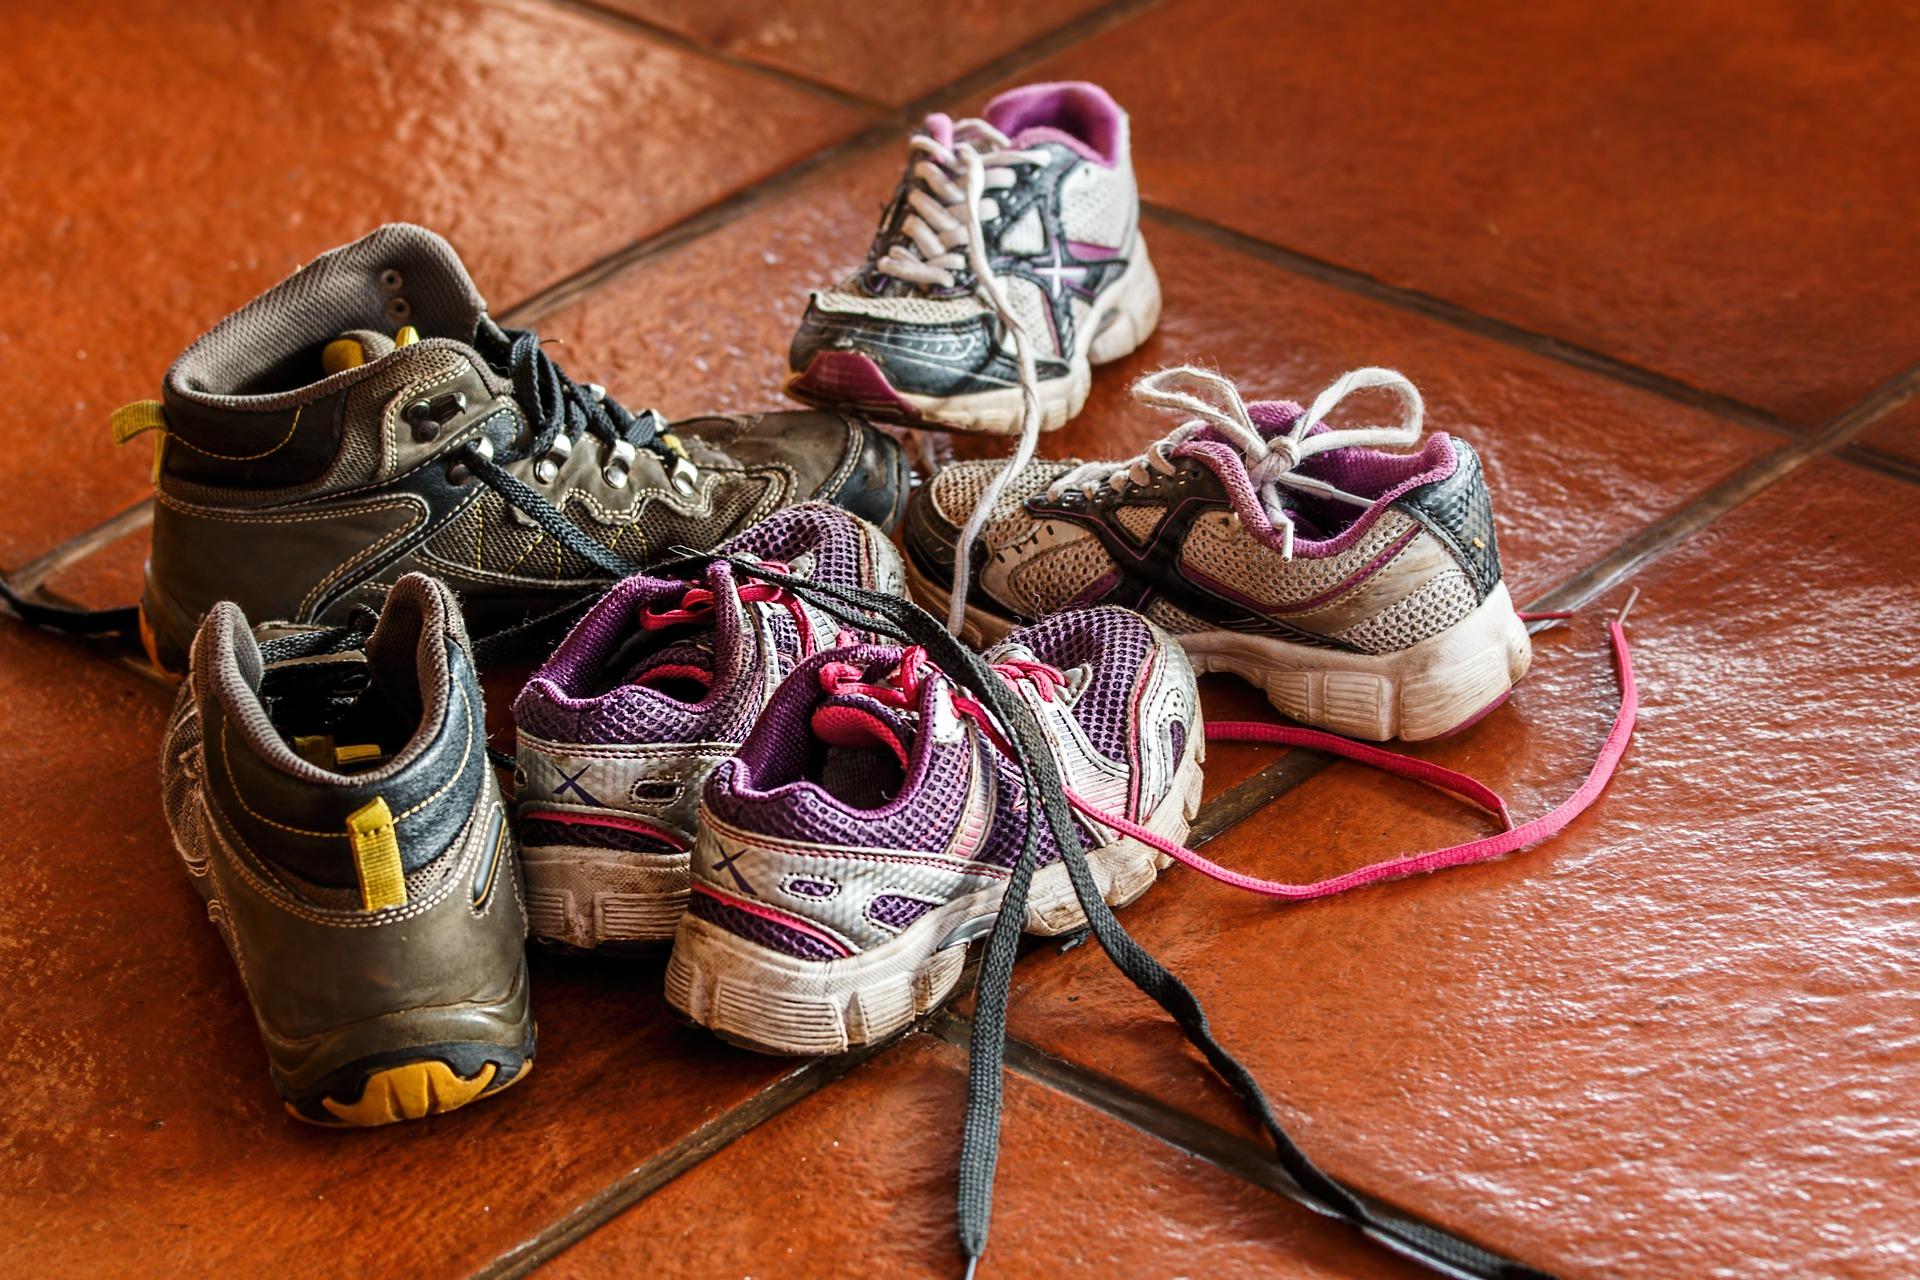 Ranger Chaussures enfants